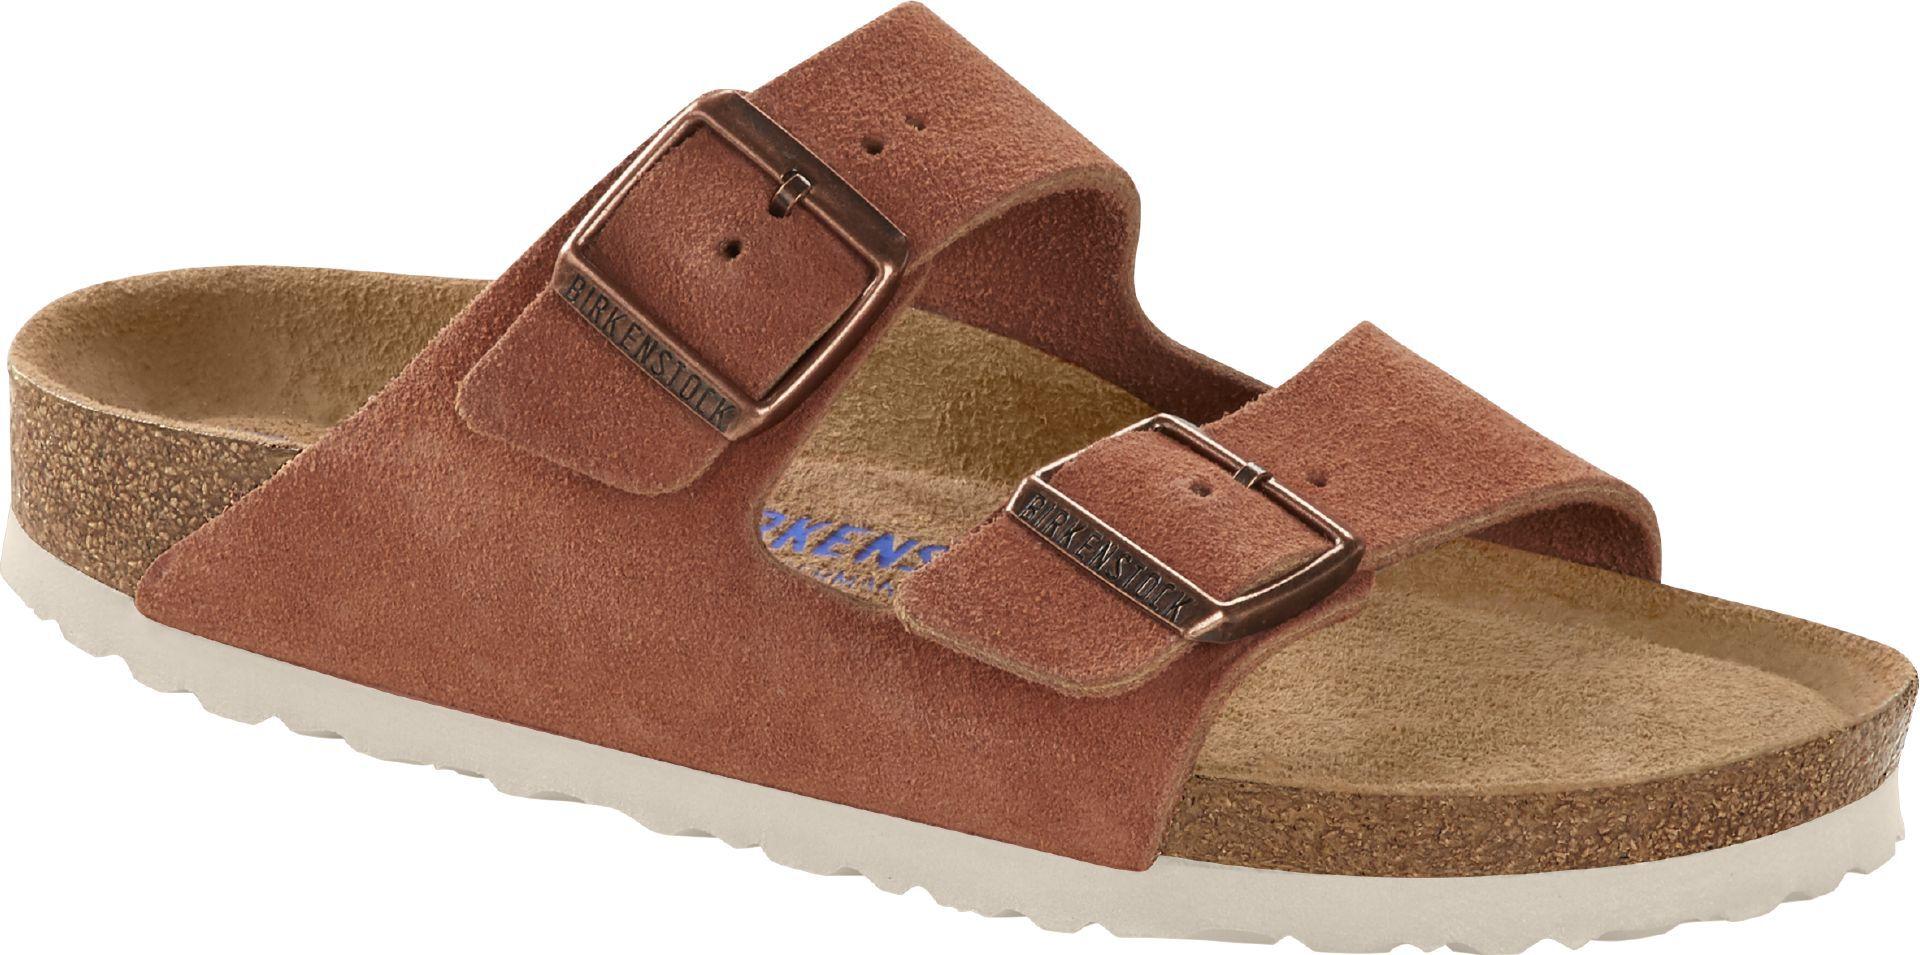 Birkenstock Arizona Soft Footbed Ladies